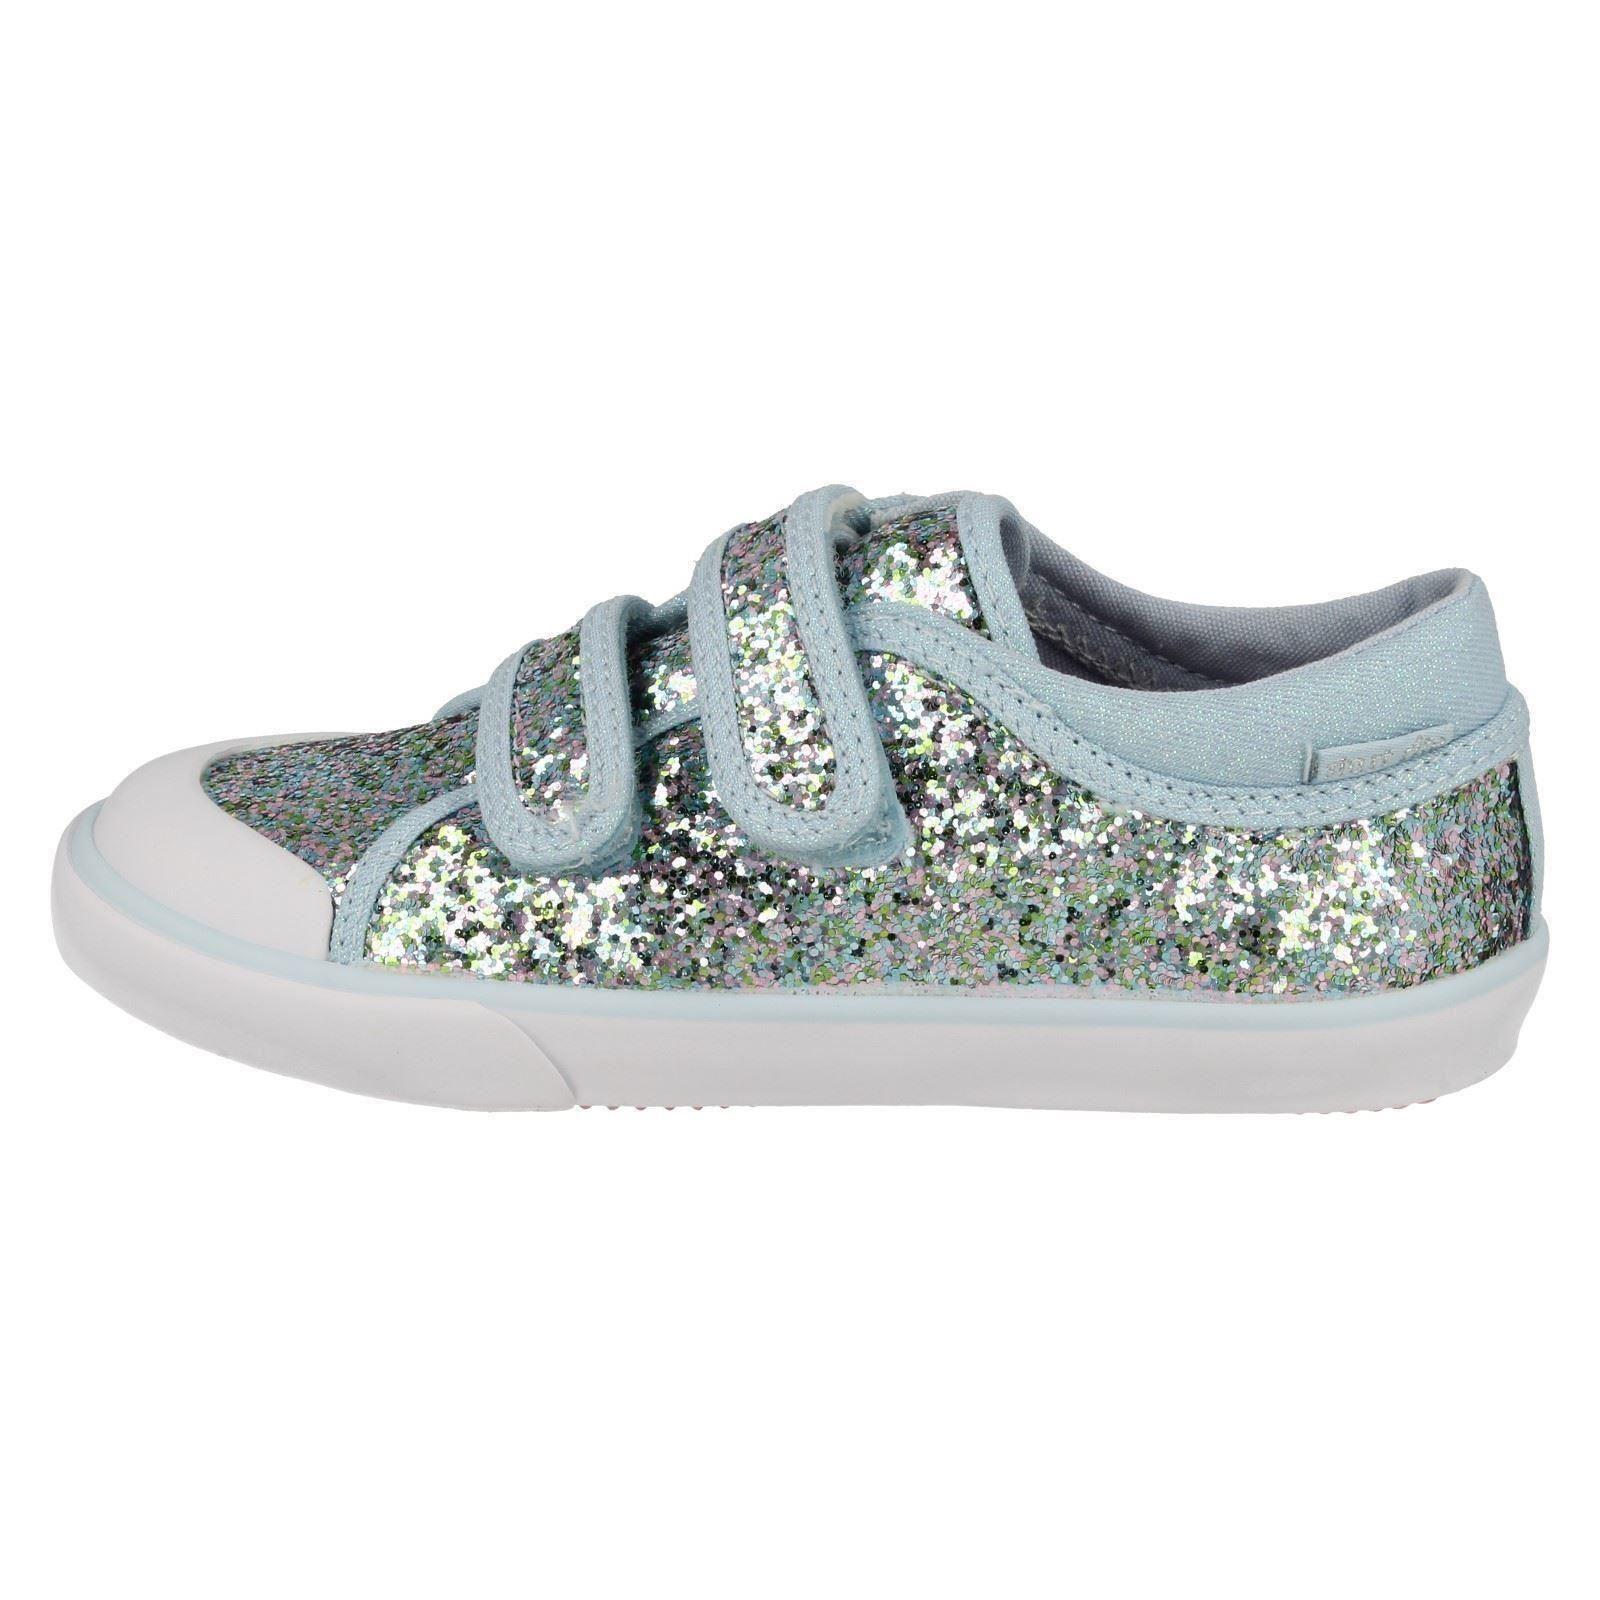 Iridescent Startrite Girls Glitter Canvas Pumps